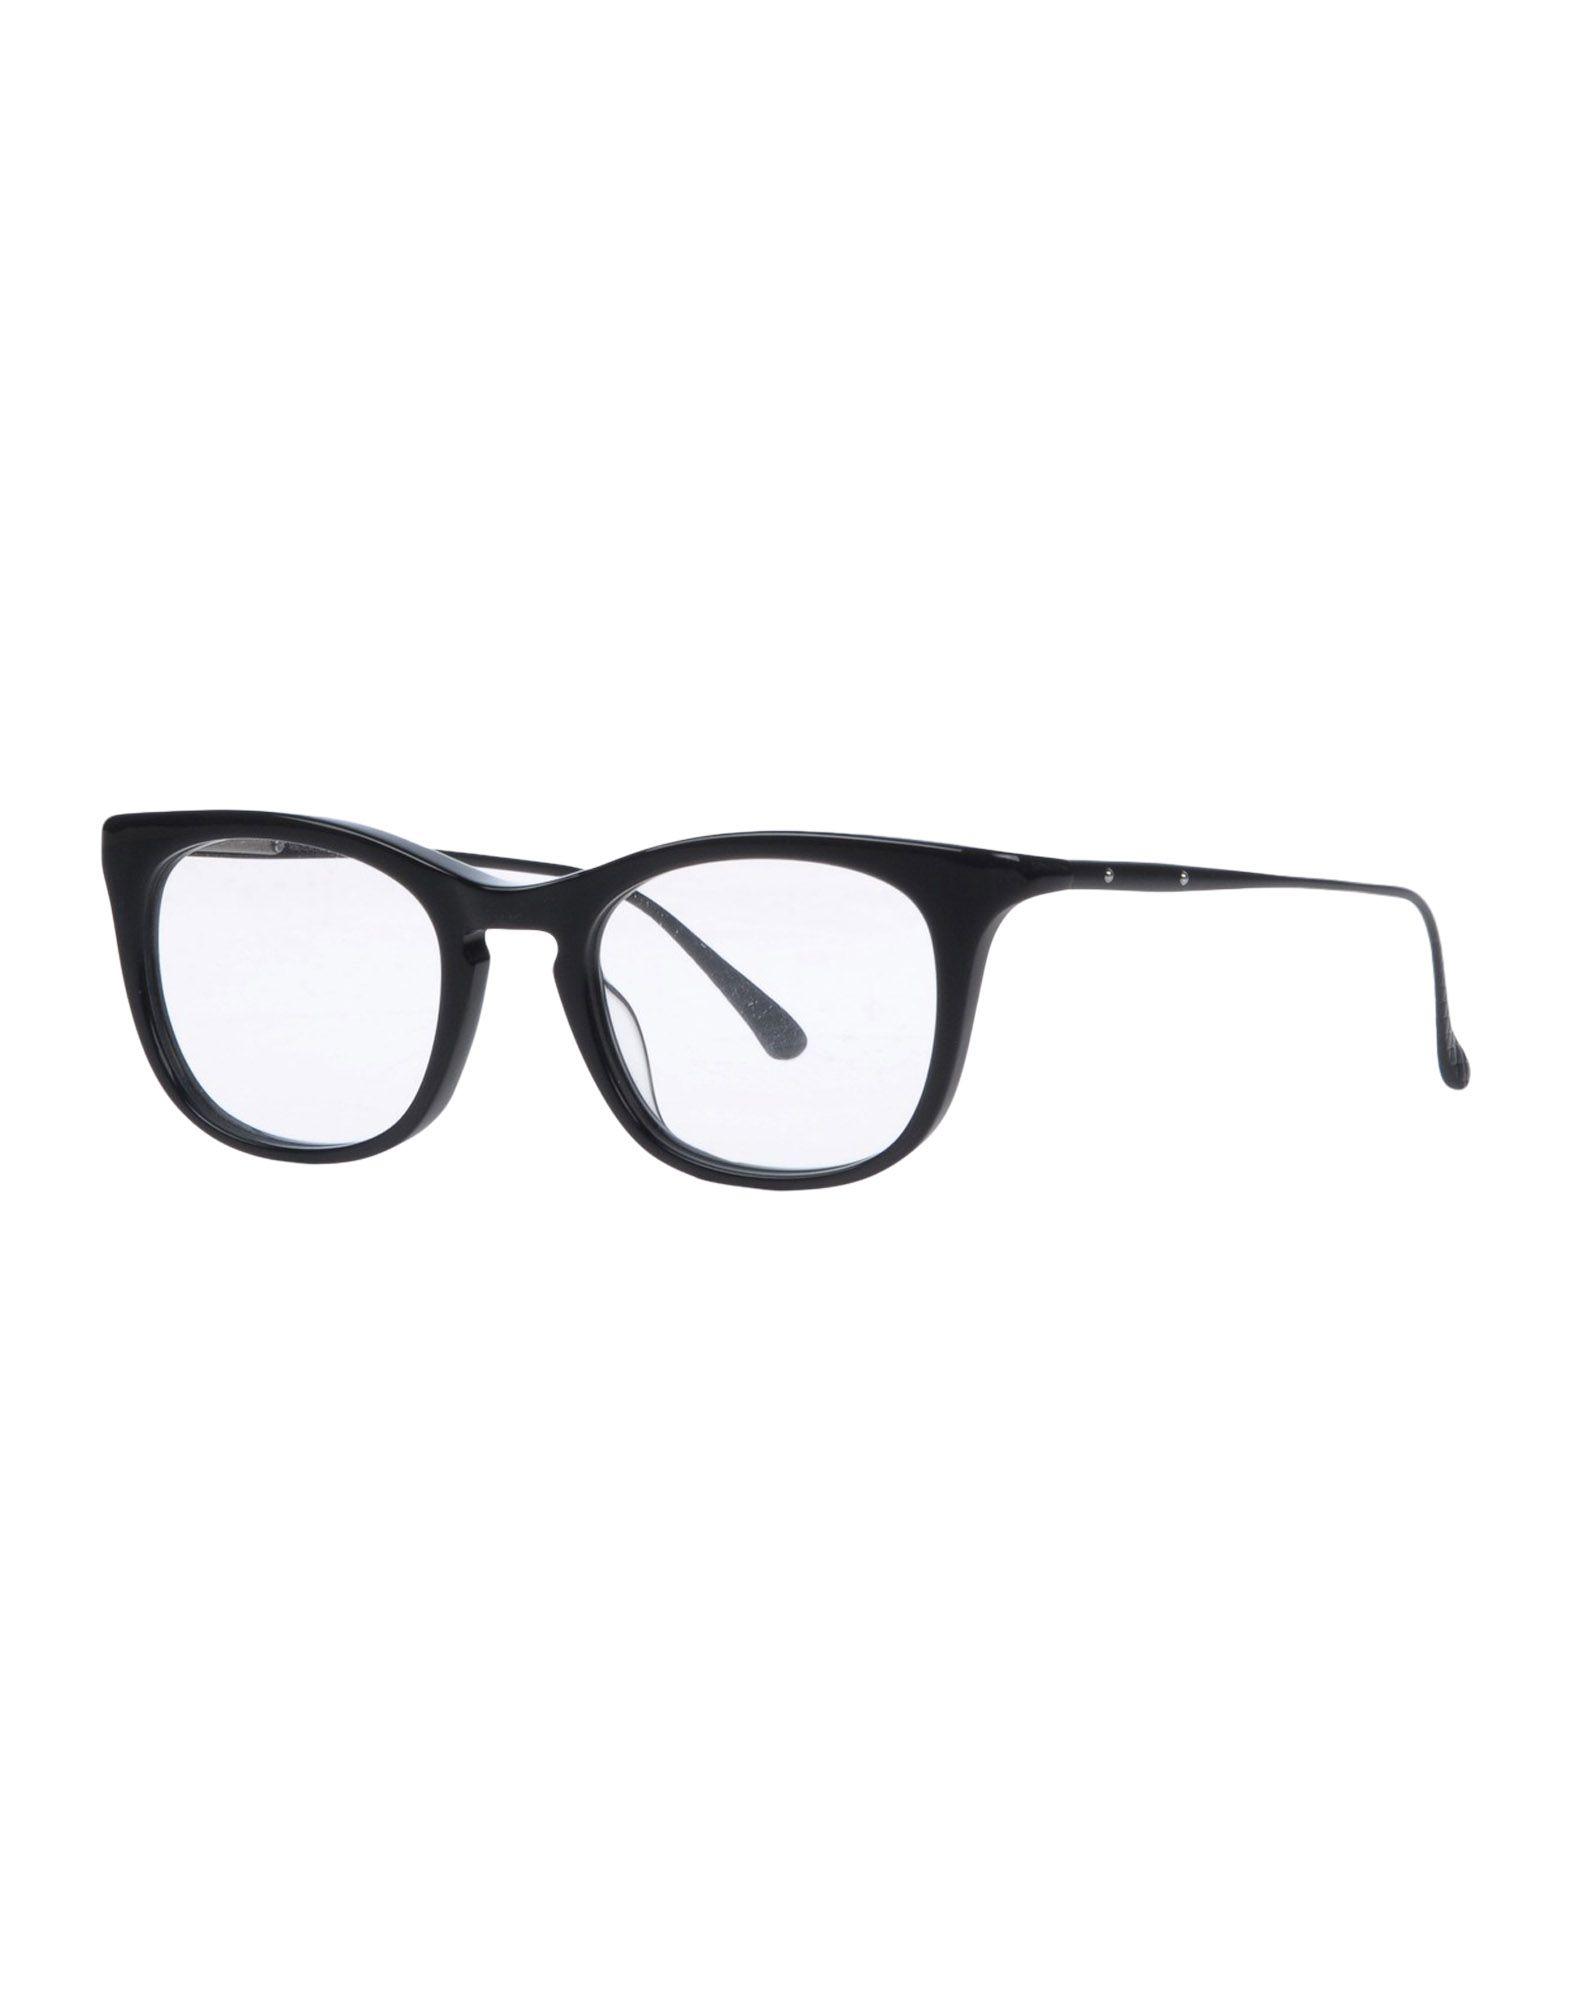 BOTTEGA VENETA Herren Brille Farbe Schwarz Größe 1